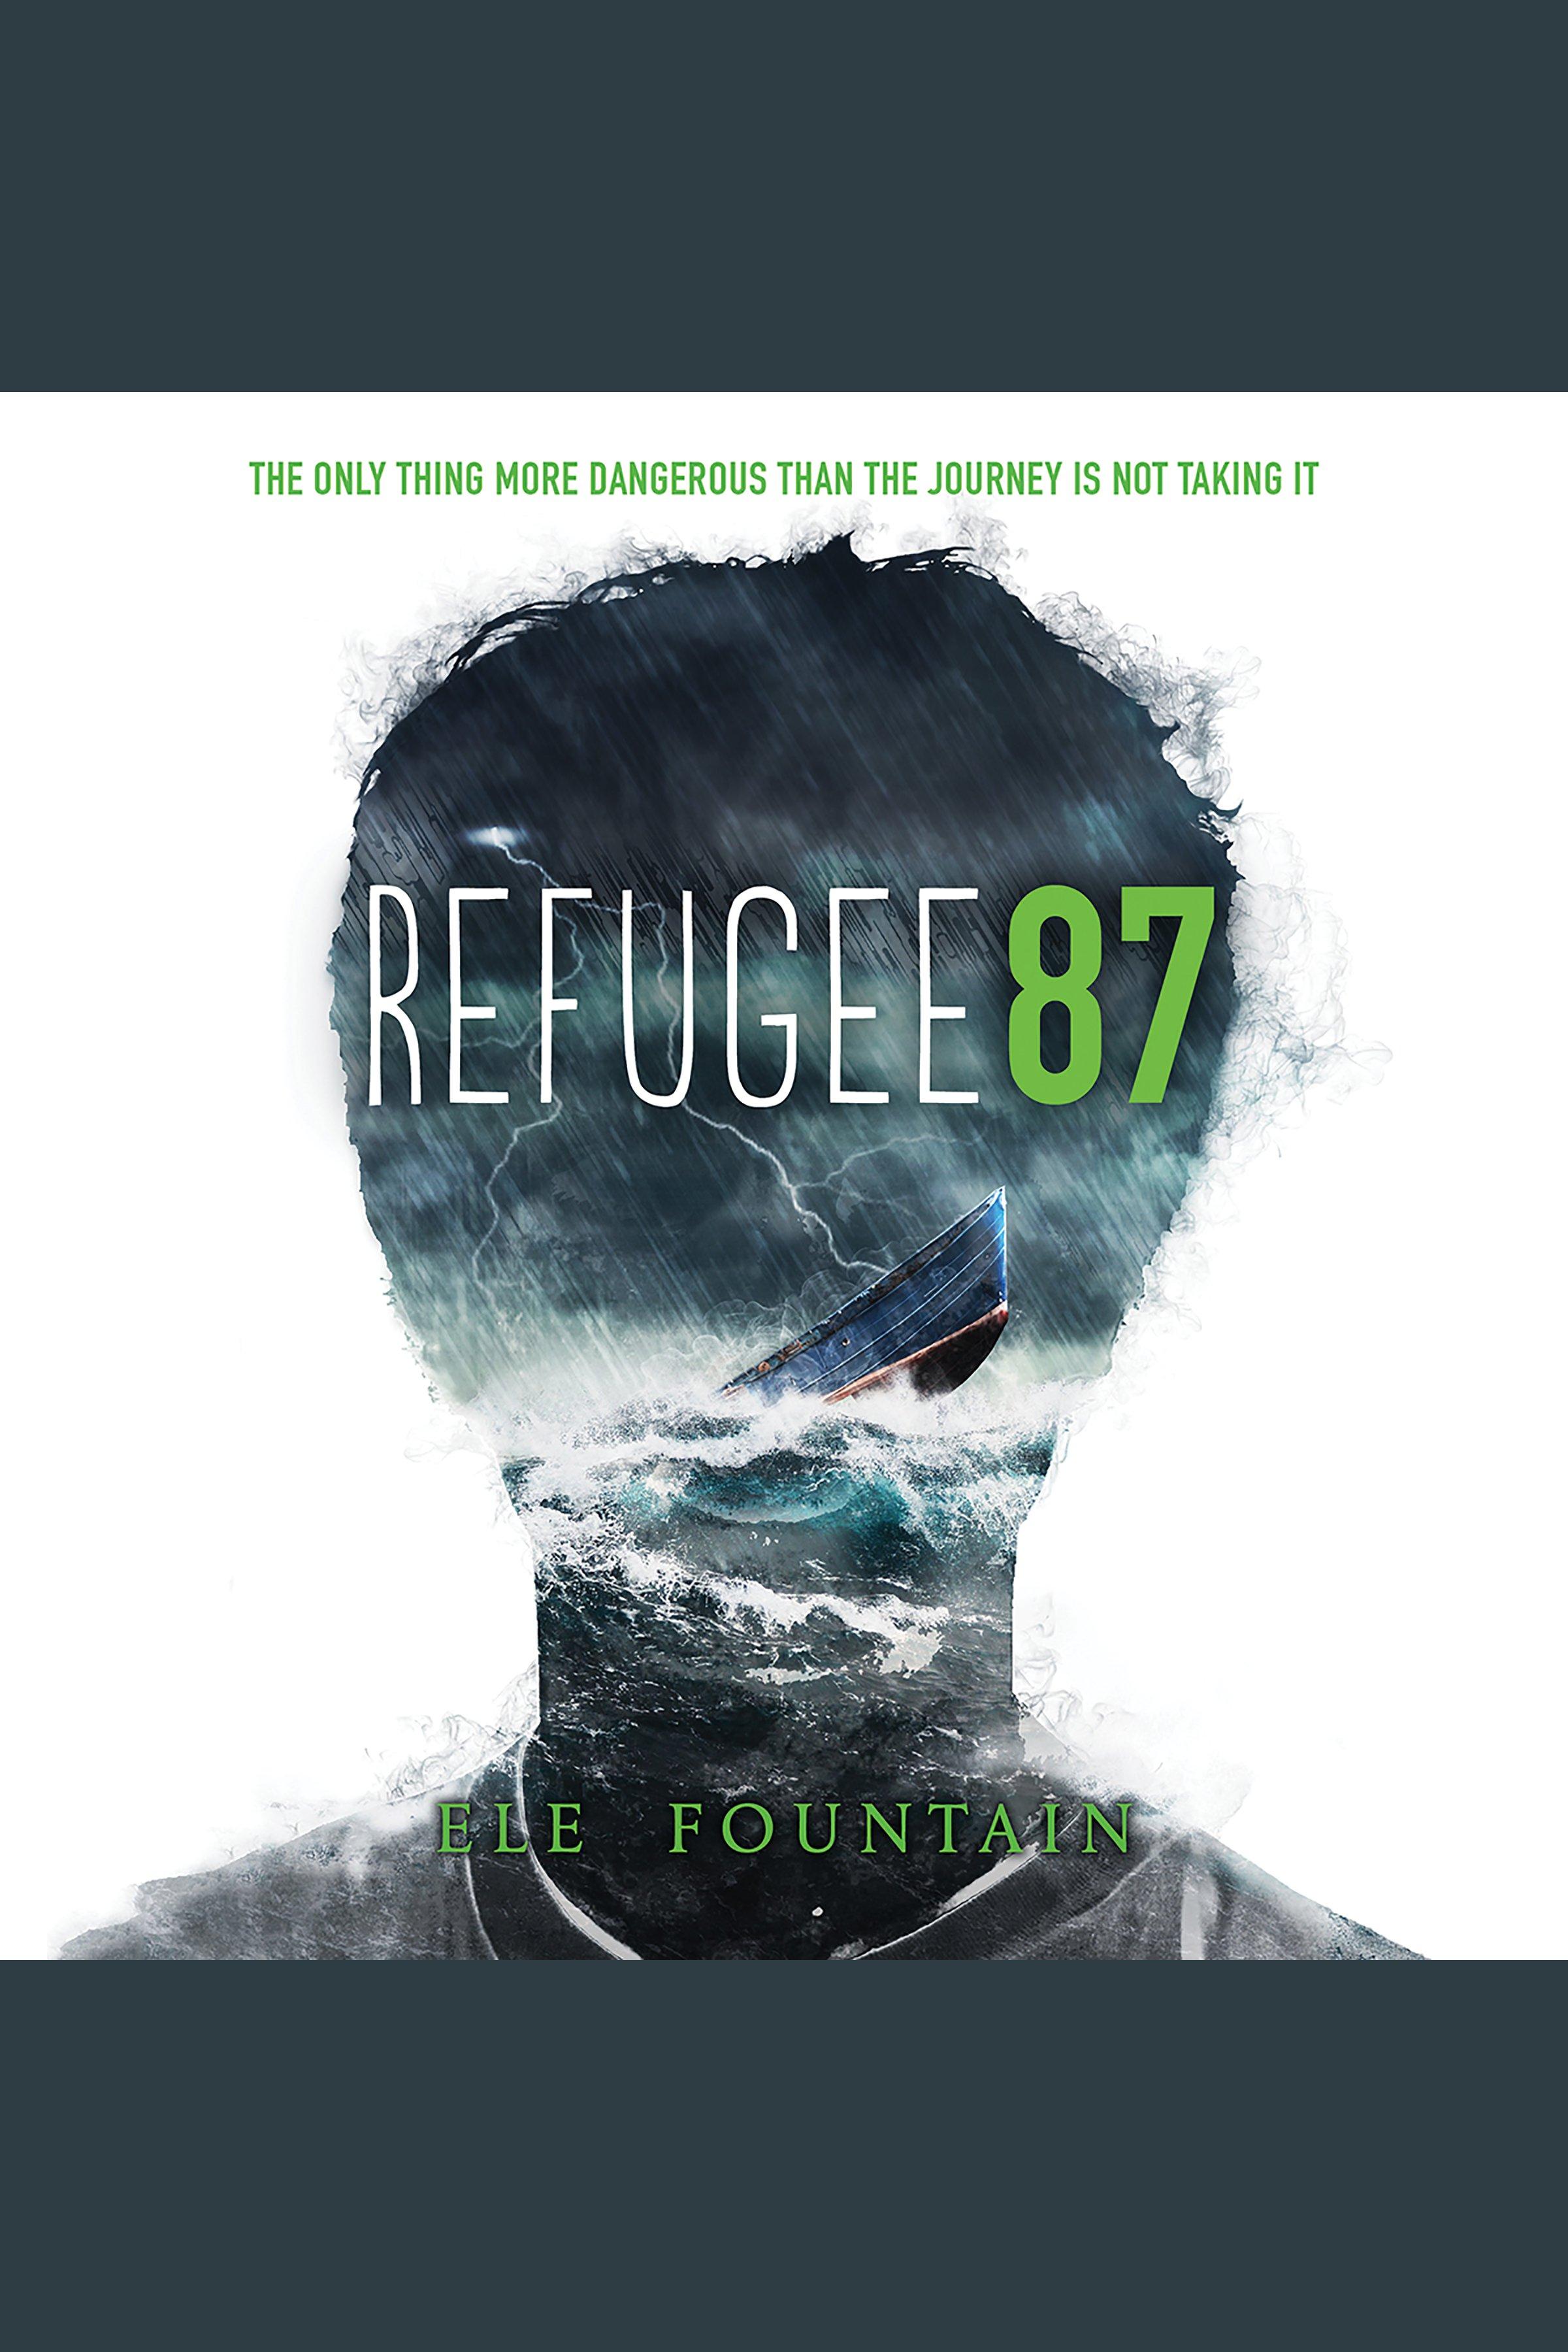 Refugee 87 cover image